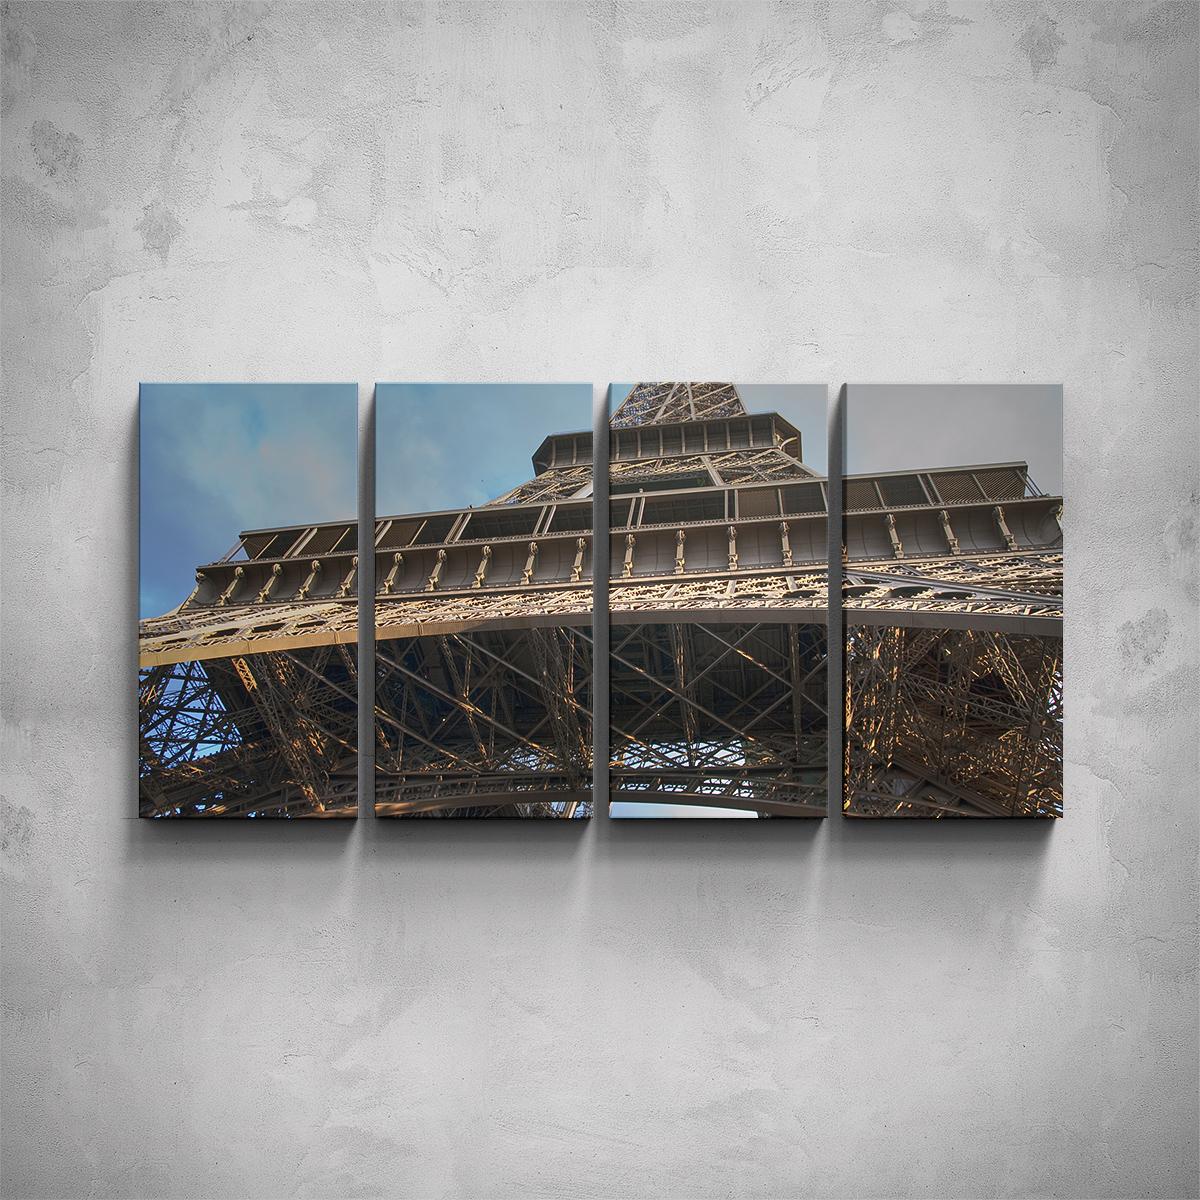 4-dílný obraz - Eiffelova věž - detail - PopyDesign